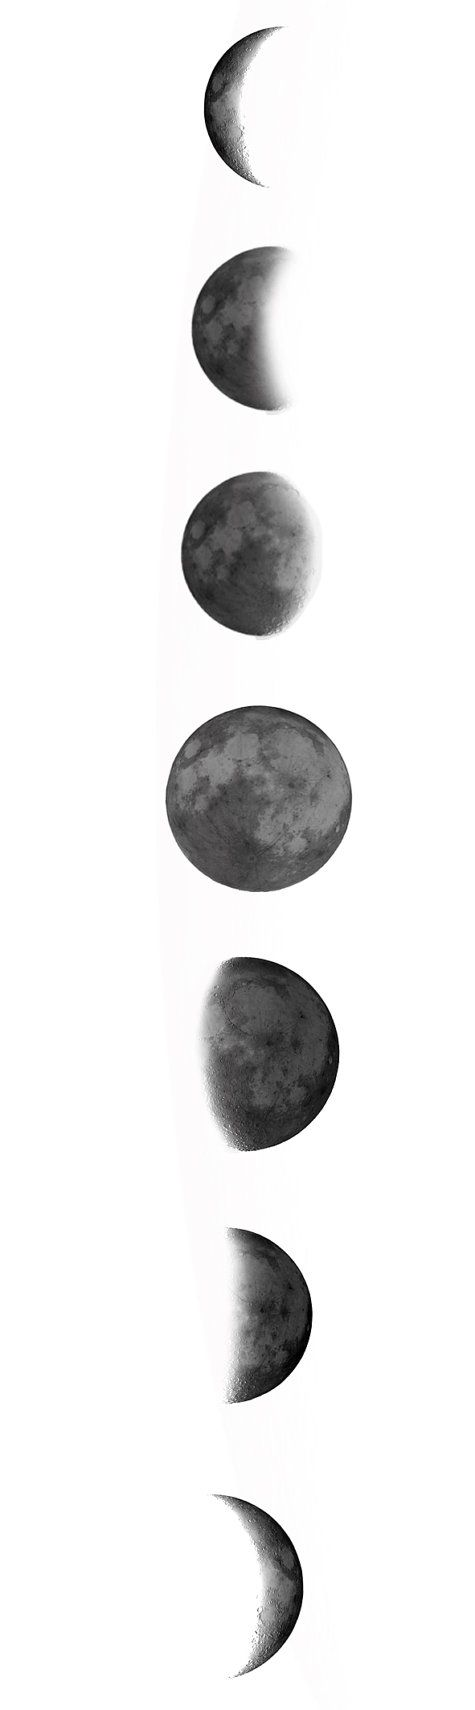 fases de la luna 2